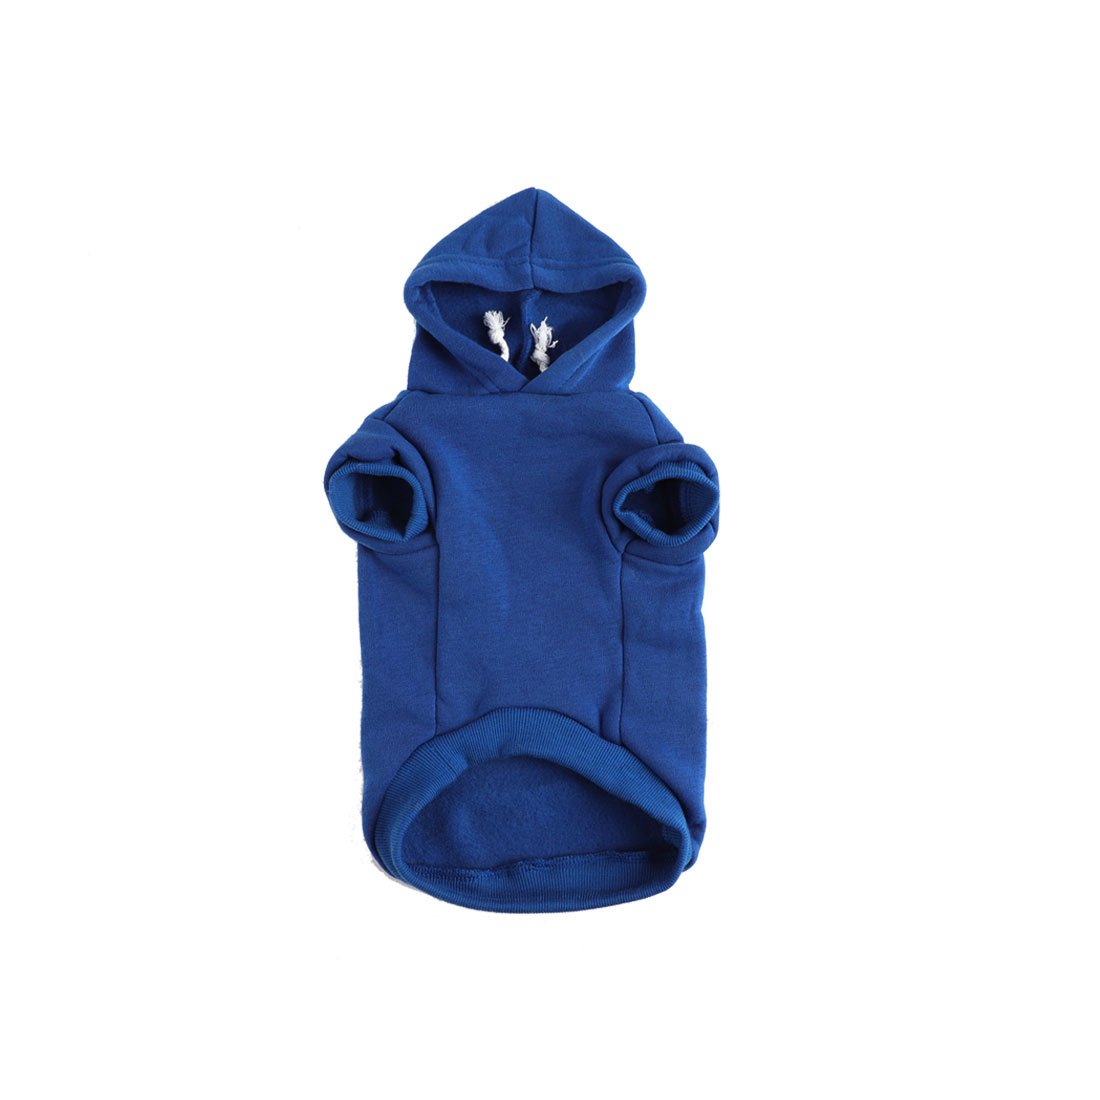 Cotton Dog Winter/Spring/Fall Sweatshirt Hoody Pet Clothes Warm Coat Blue M - image 7 of 7